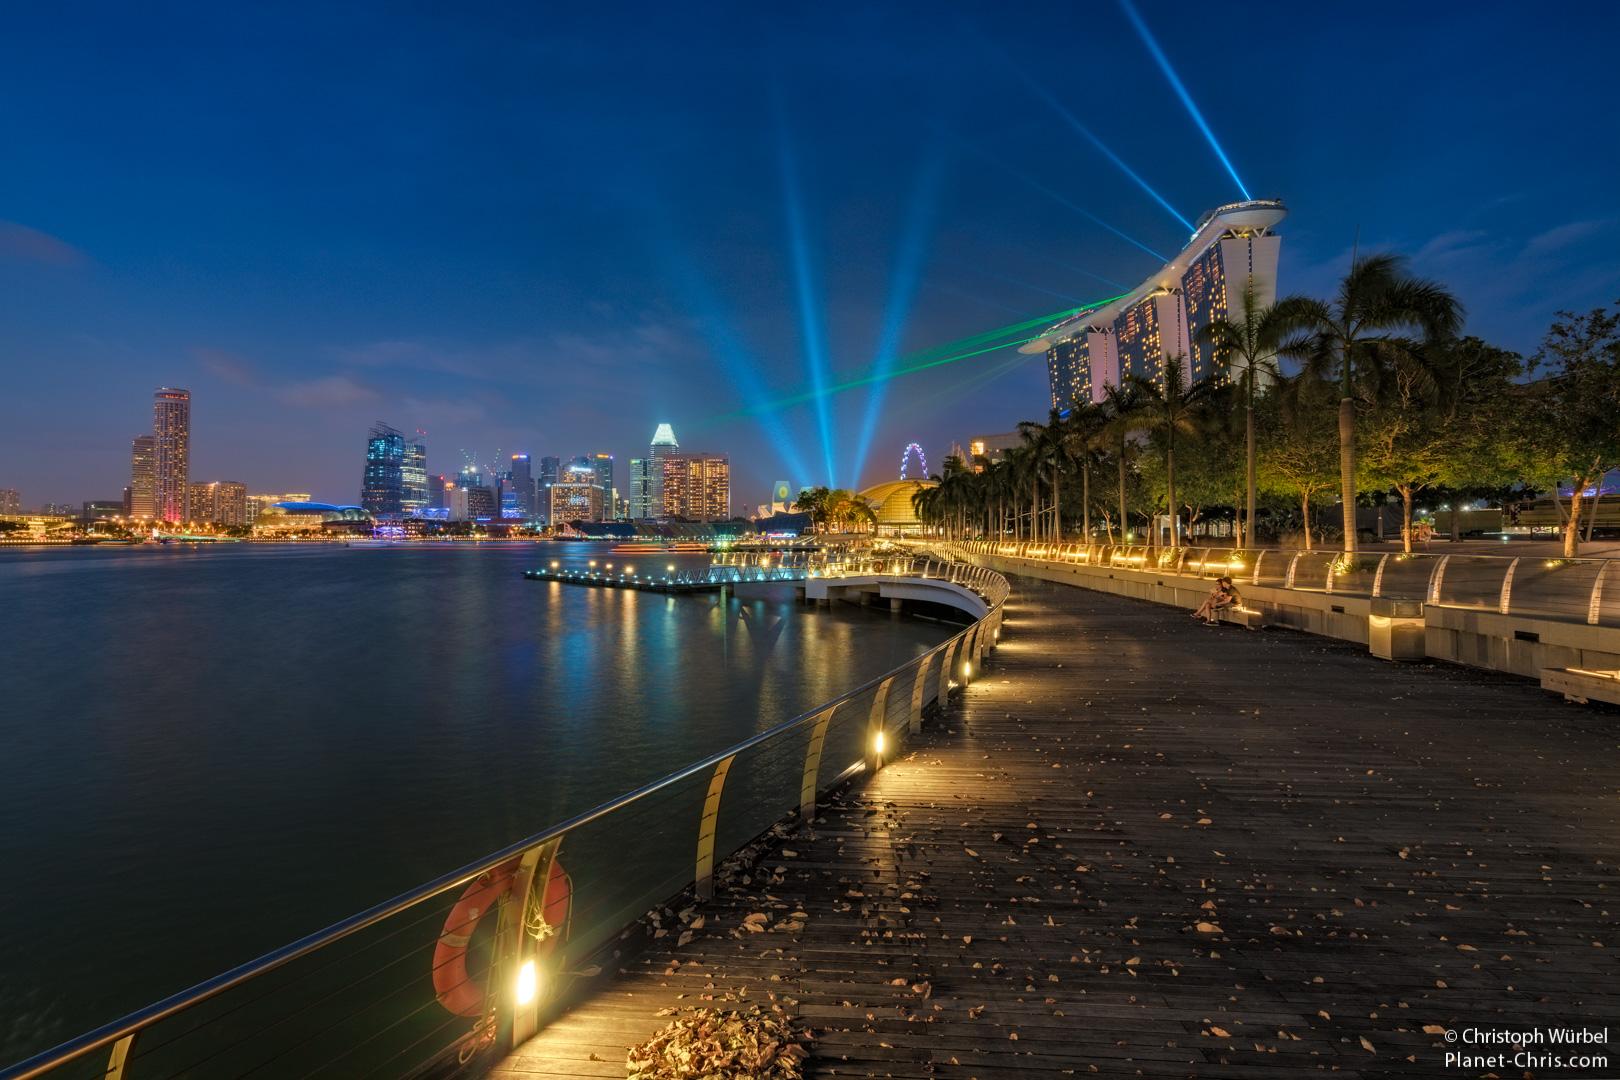 Marina Bay Sands Lasers, Singapore